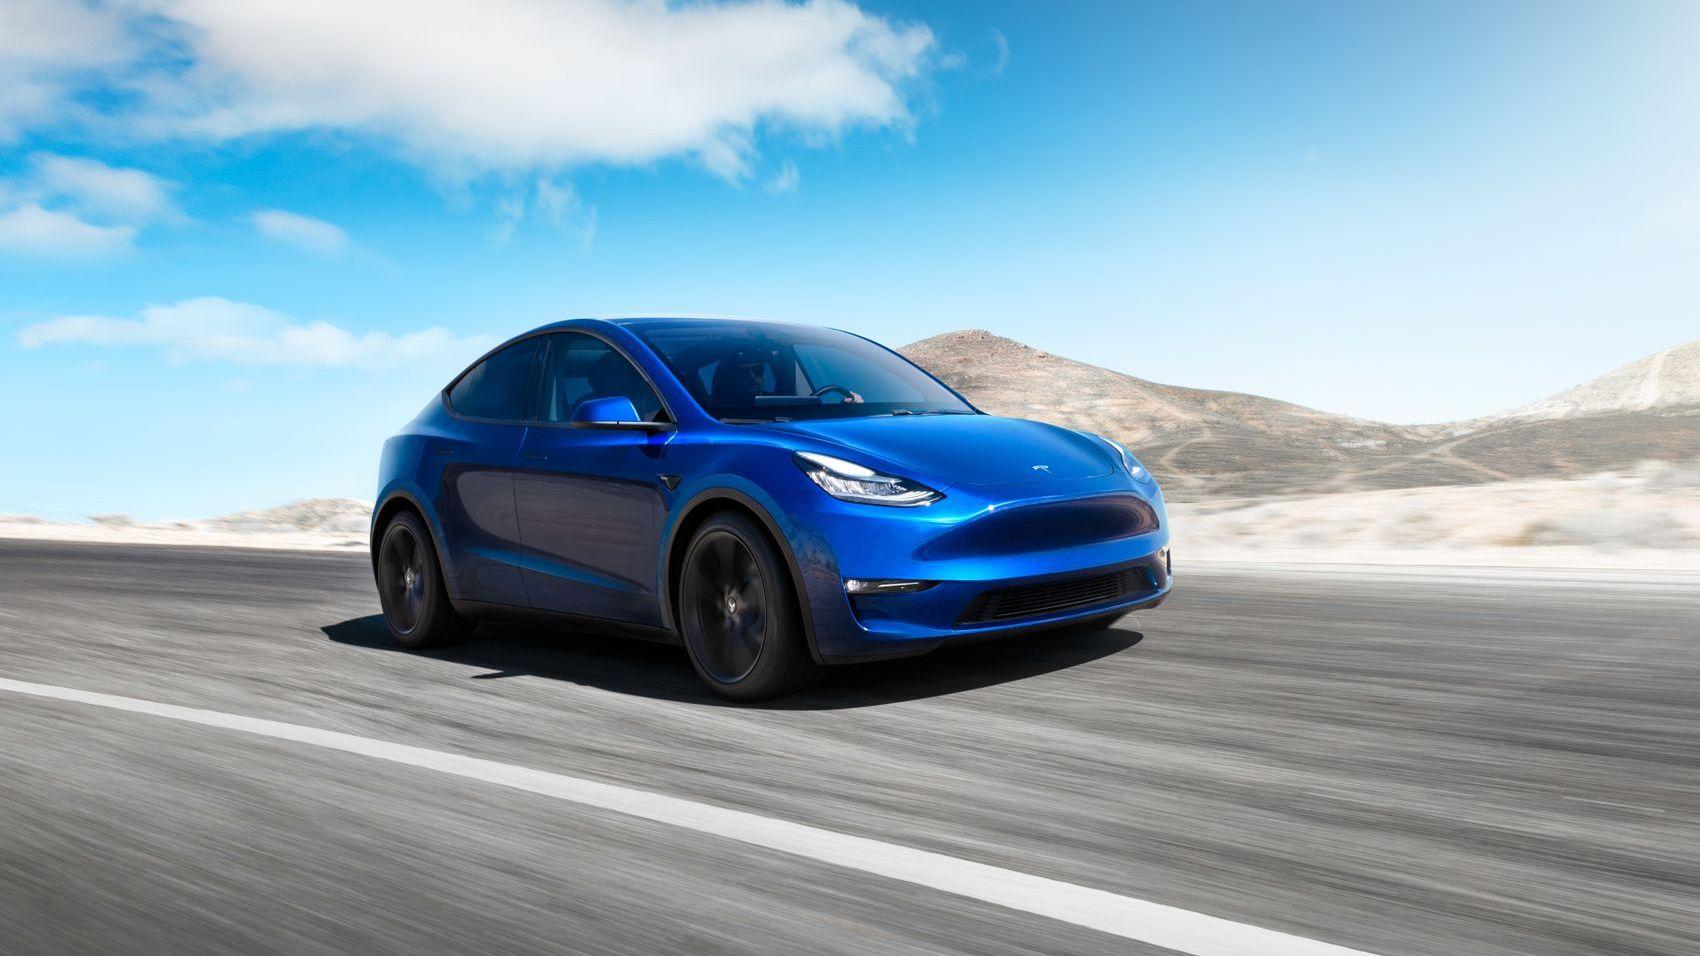 Storbank hevder Tesla kan fremskynde Model Y-produksjonen